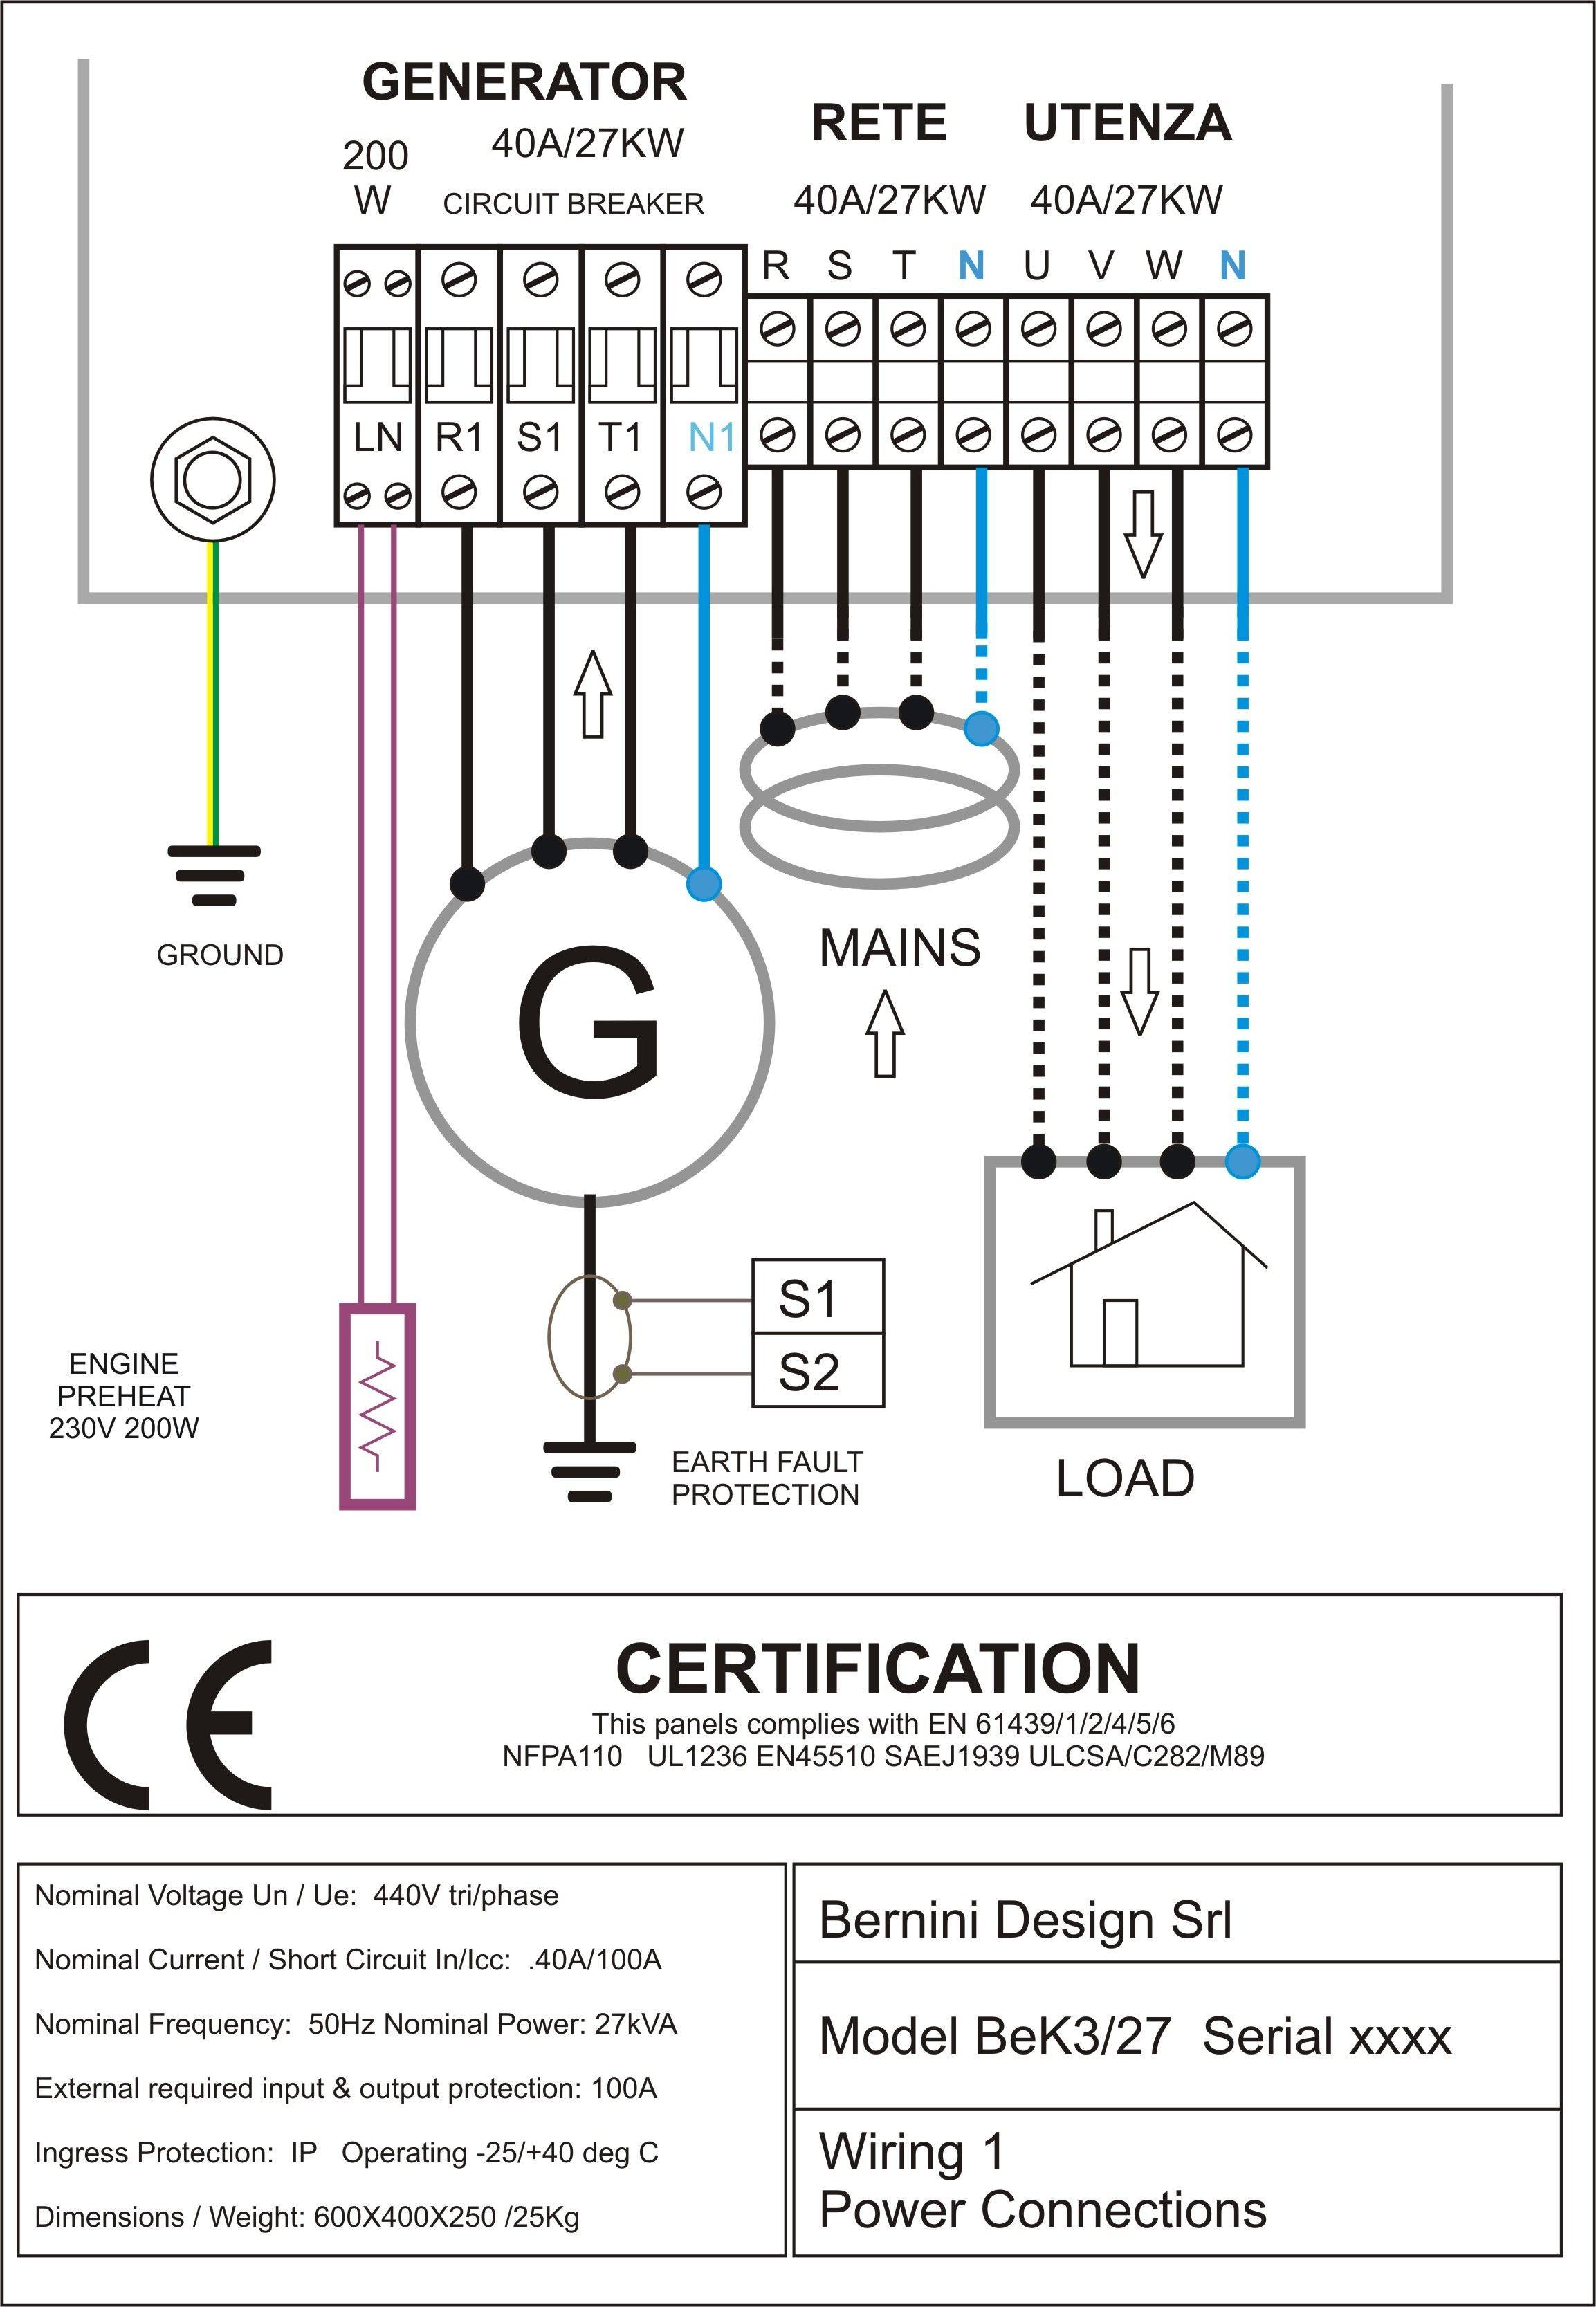 Home Generator Transfer Switch Wiring Diagram from detoxicrecenze.com